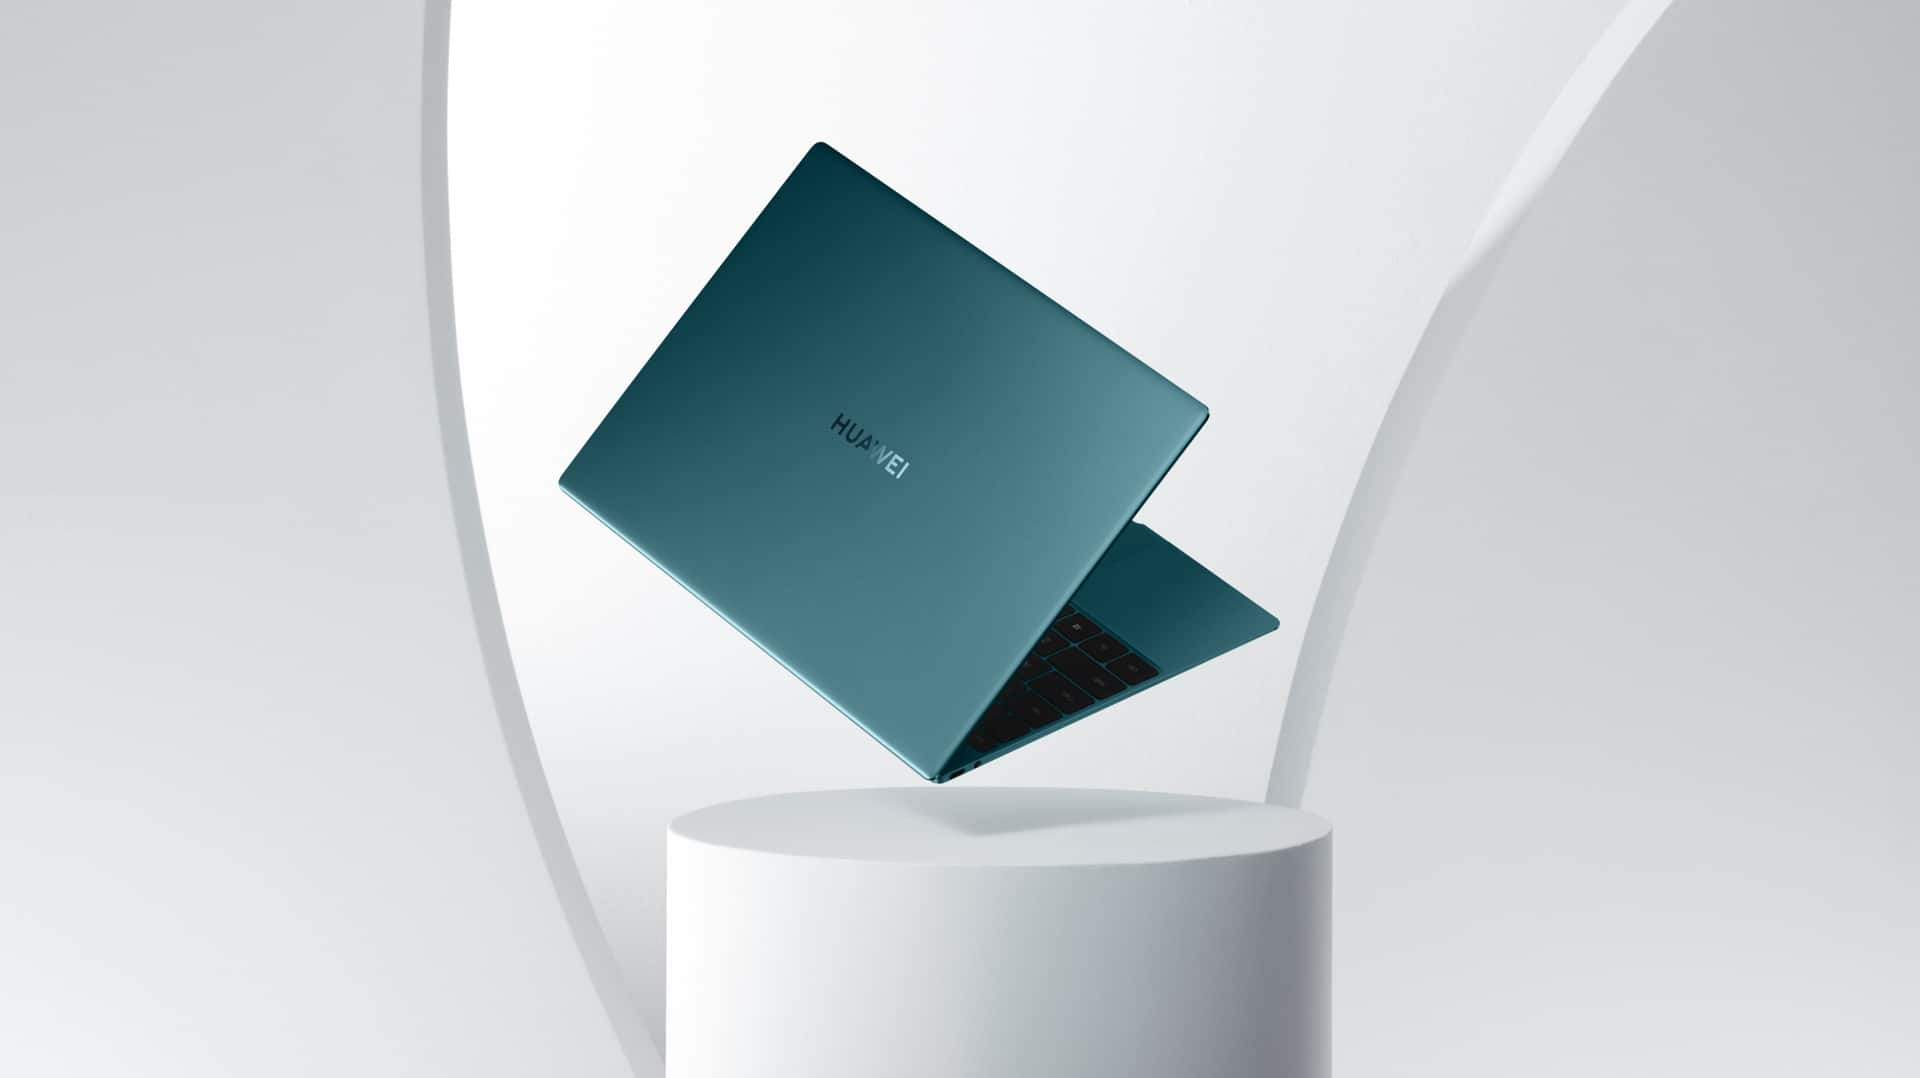 Huawei MateBook X image 7